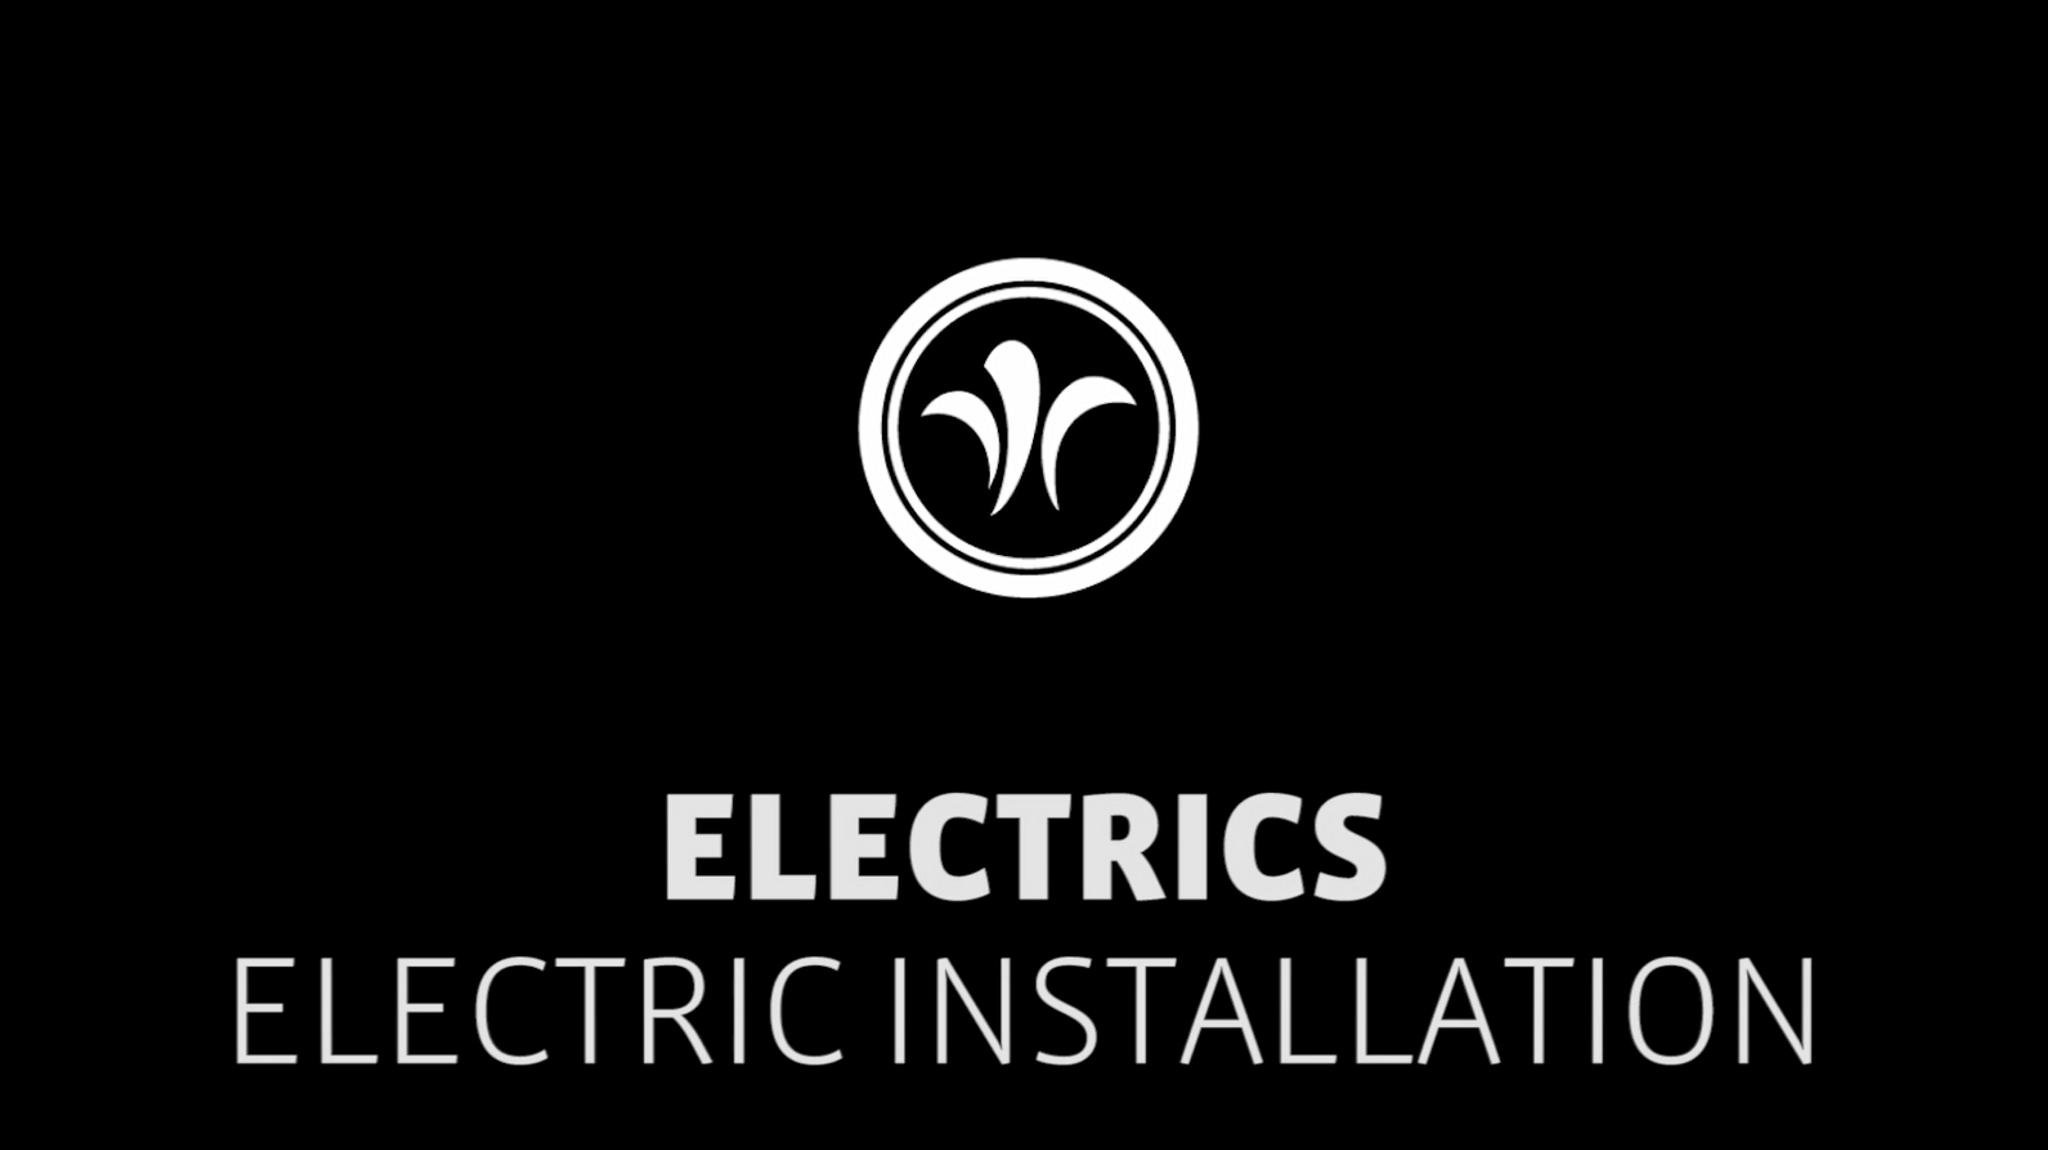 motorhome electrical-installation // niesmann+bischoff - camper (model ARTO) // 2019 // EL8